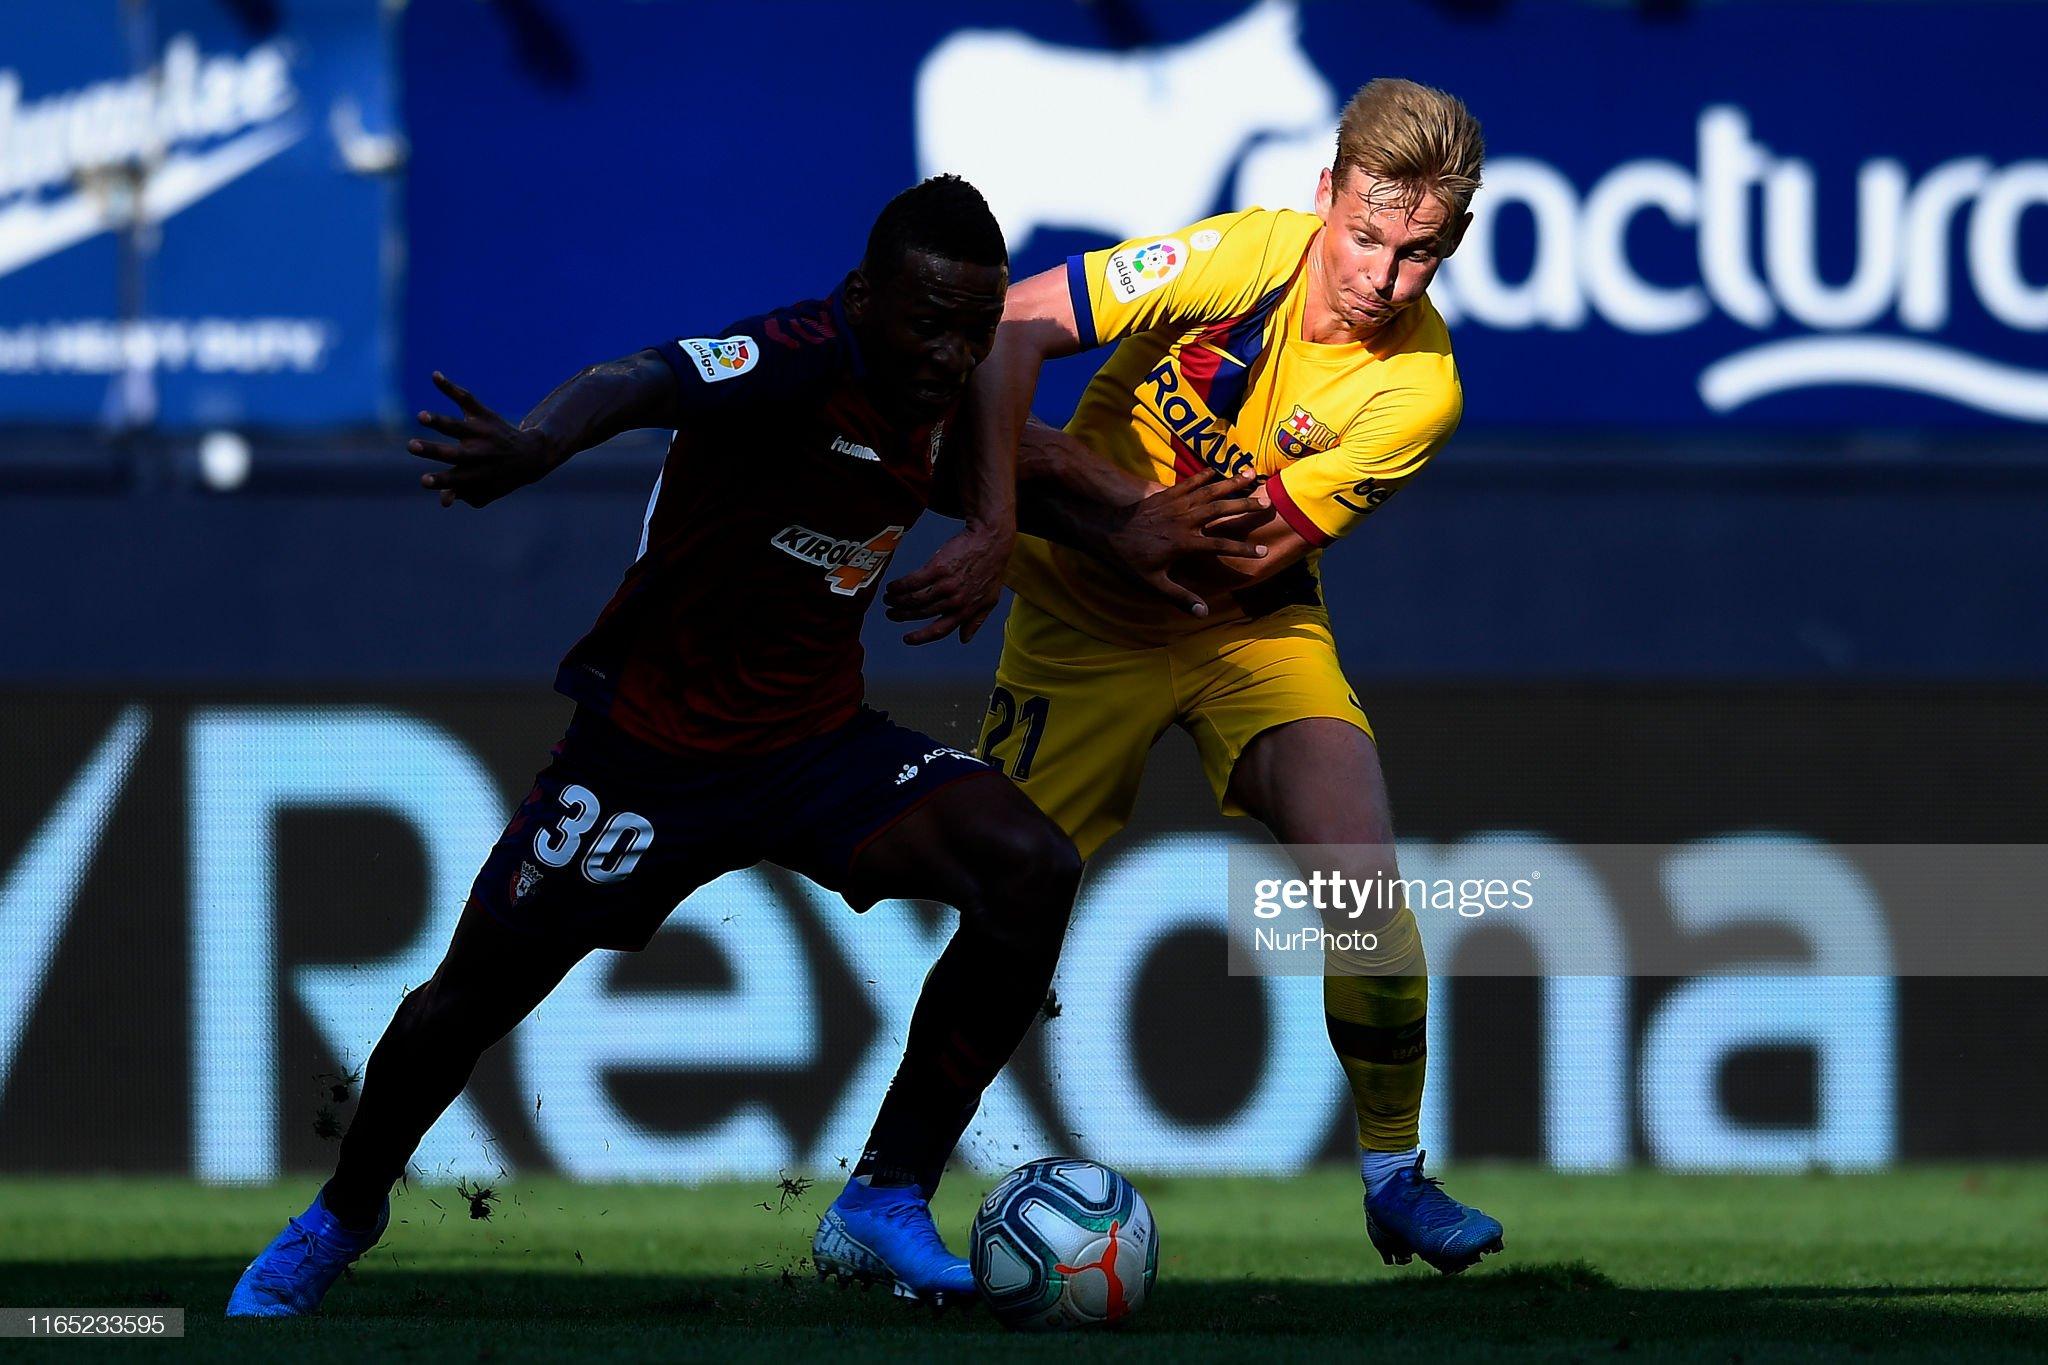 صور مباراة : أوساسونا - برشلونة 2-2 ( 31-08-2019 )  Frenkie-de-jong-of-barcelona-and-pervis-estupinan-of-osasuna-competes-picture-id1165233595?s=2048x2048